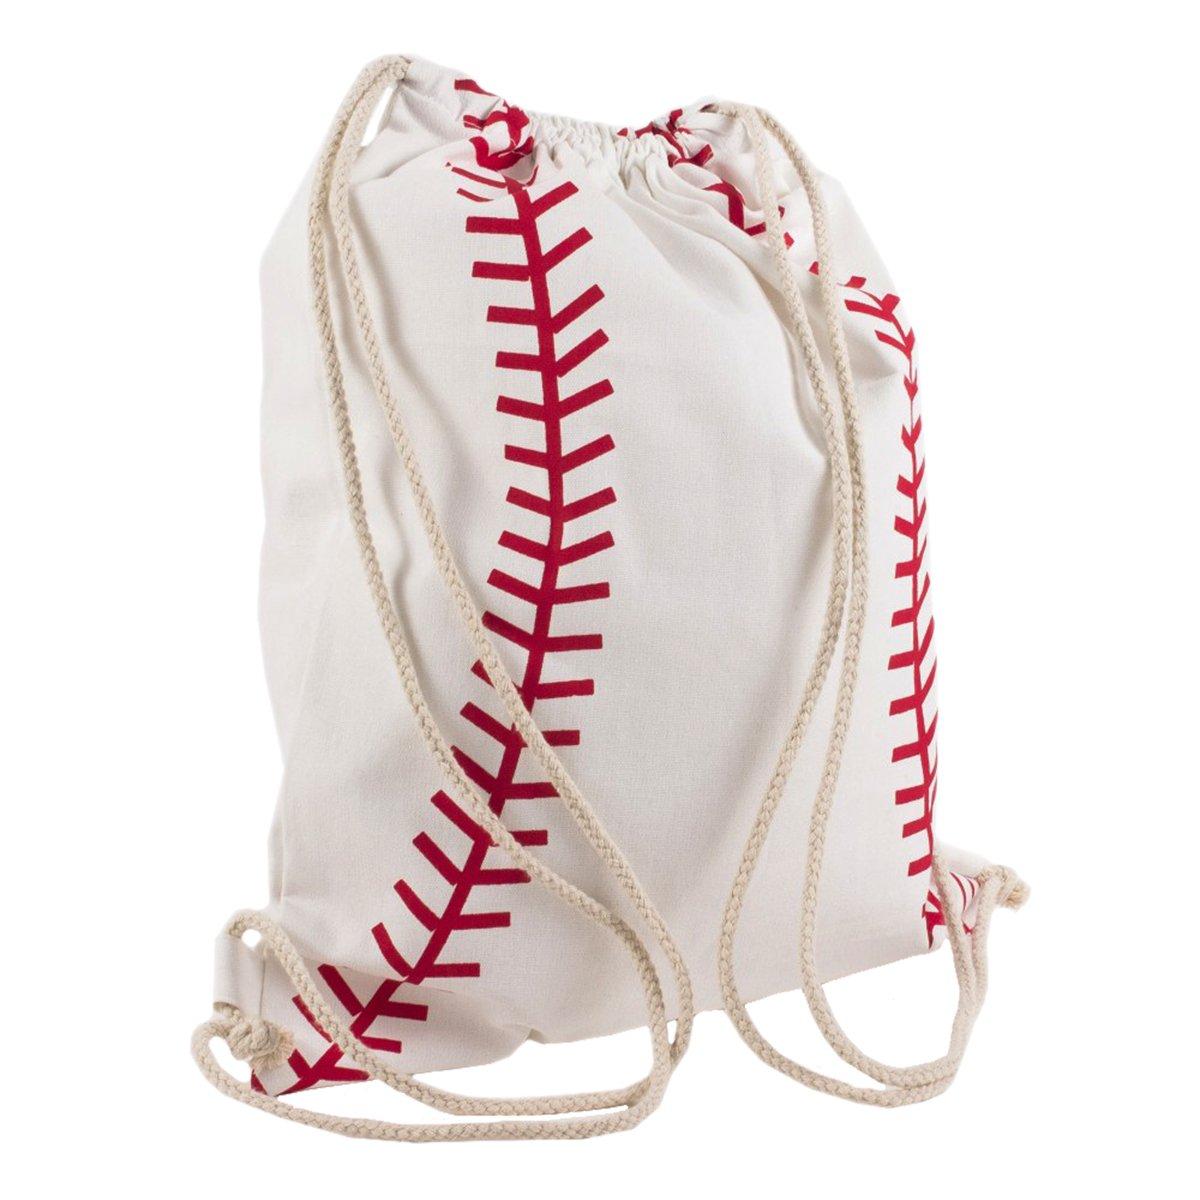 Baseball White Red 14 x 18 Inch Kids Drawstring Backpack